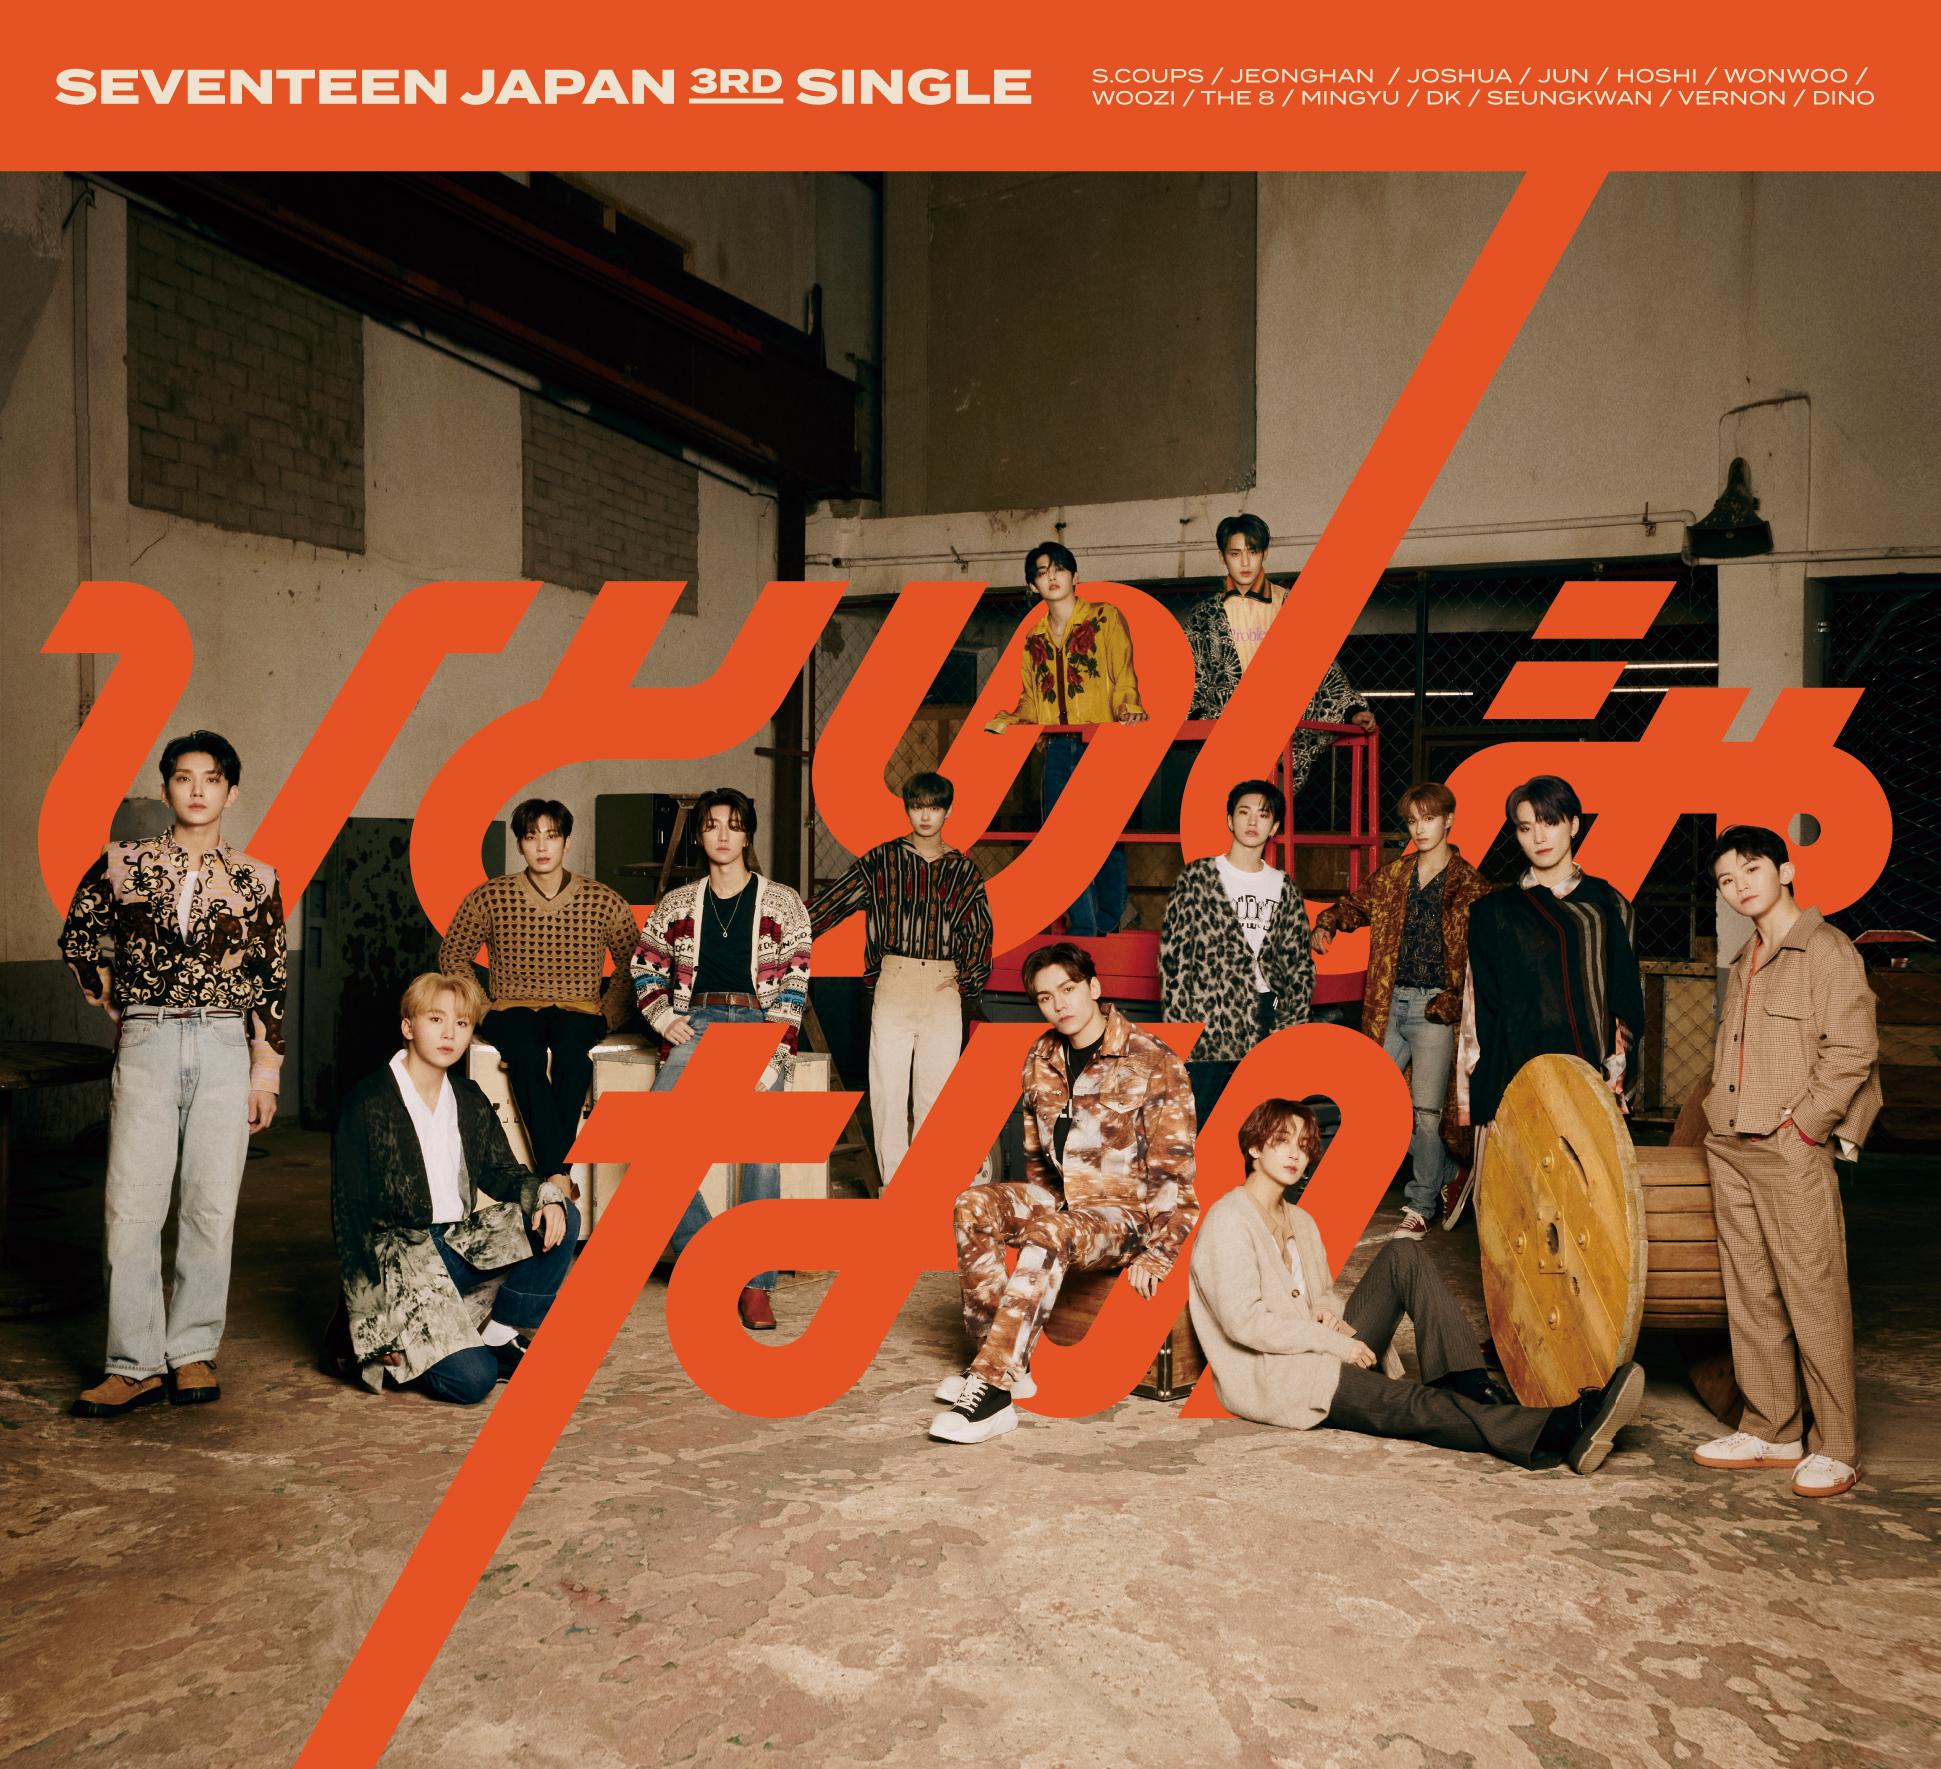 SEVENTEEN JAPAN 3RD SINGLE 「ひとりじゃない」